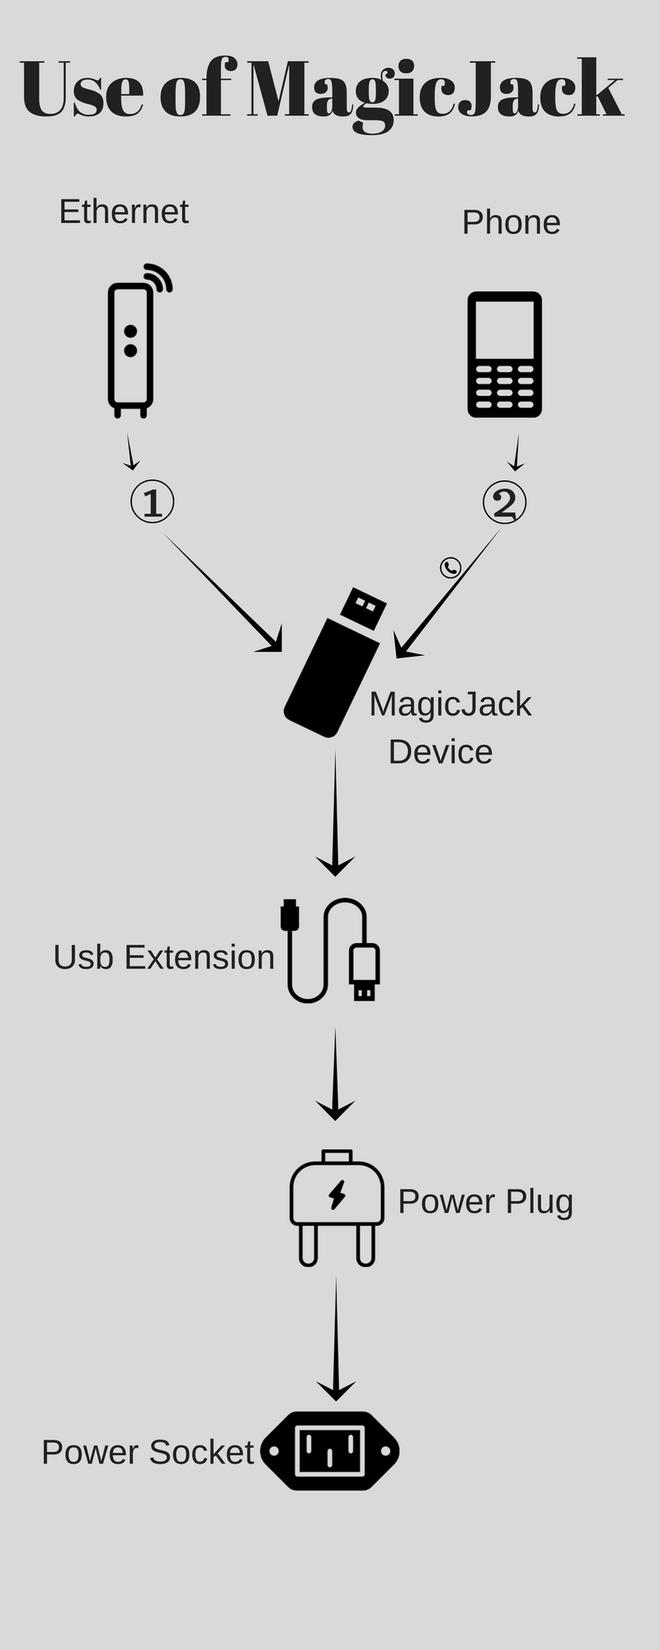 How to Use MagicJack Device 2018 Plugs, Landline phone, Usb